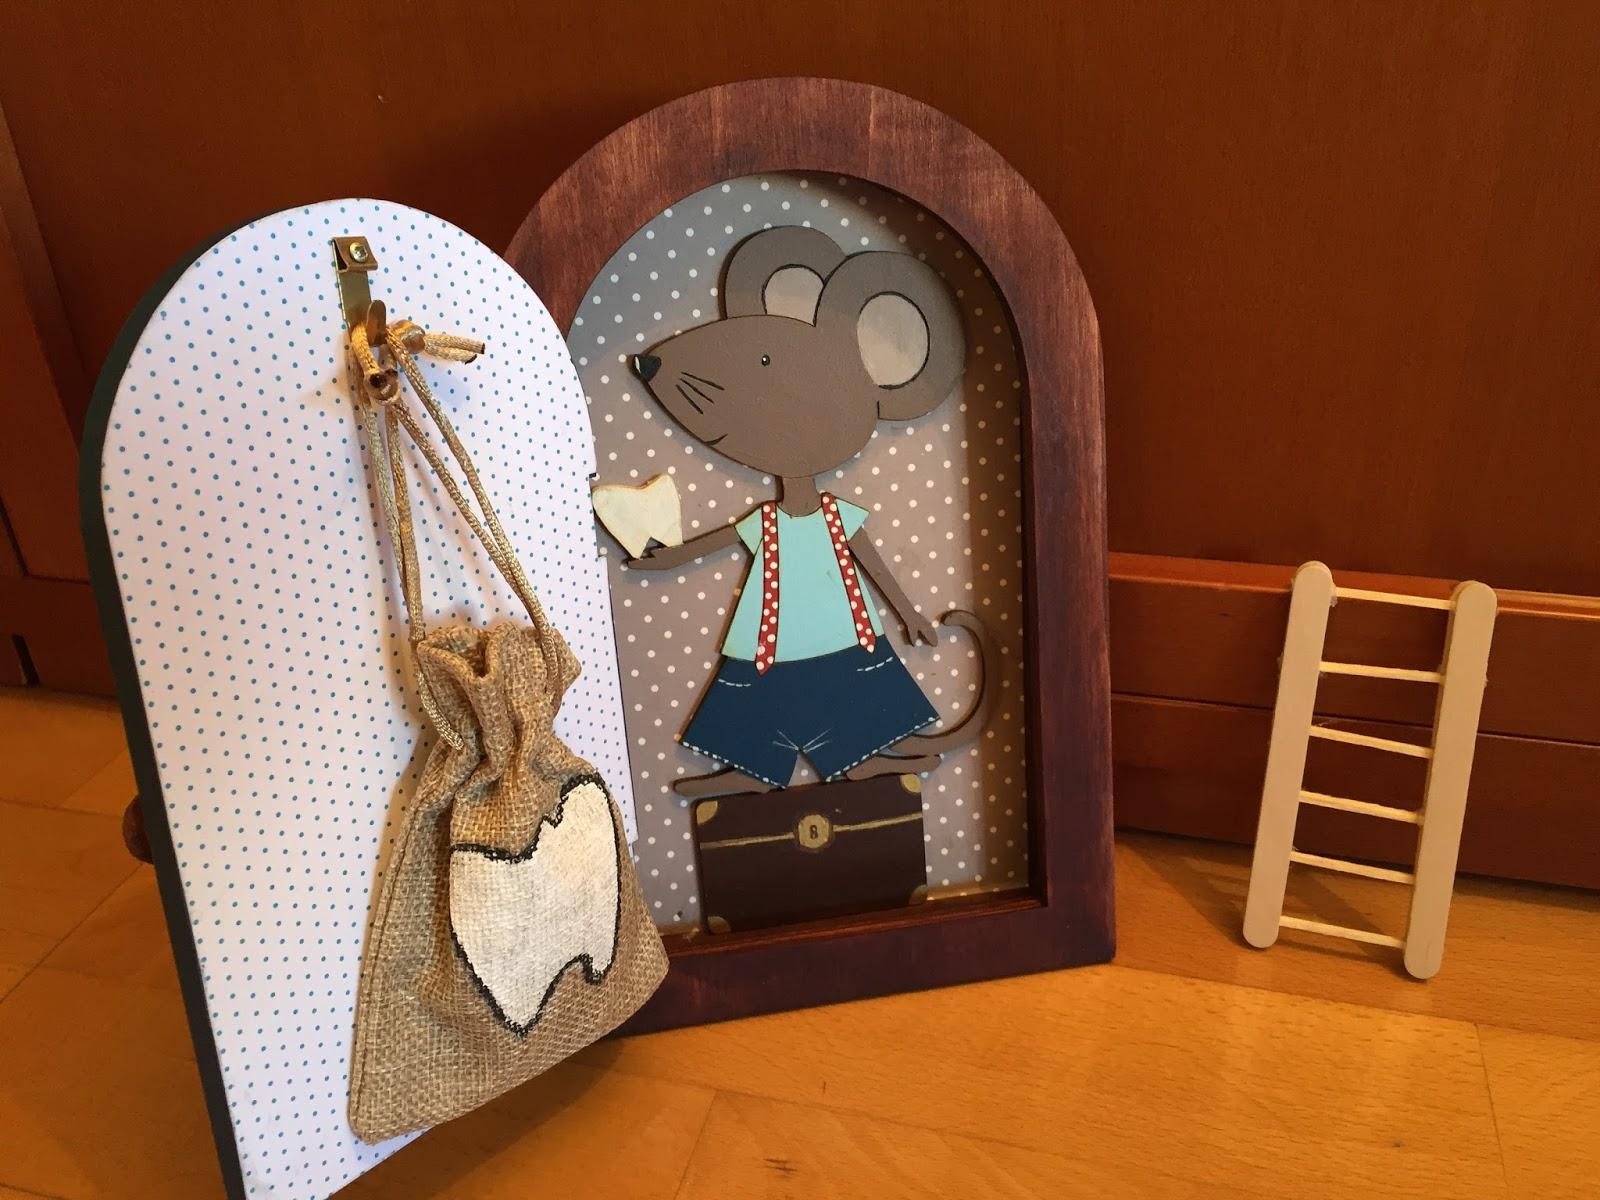 Craftsmode puerta ratoncito p rez for Puerta raton perez